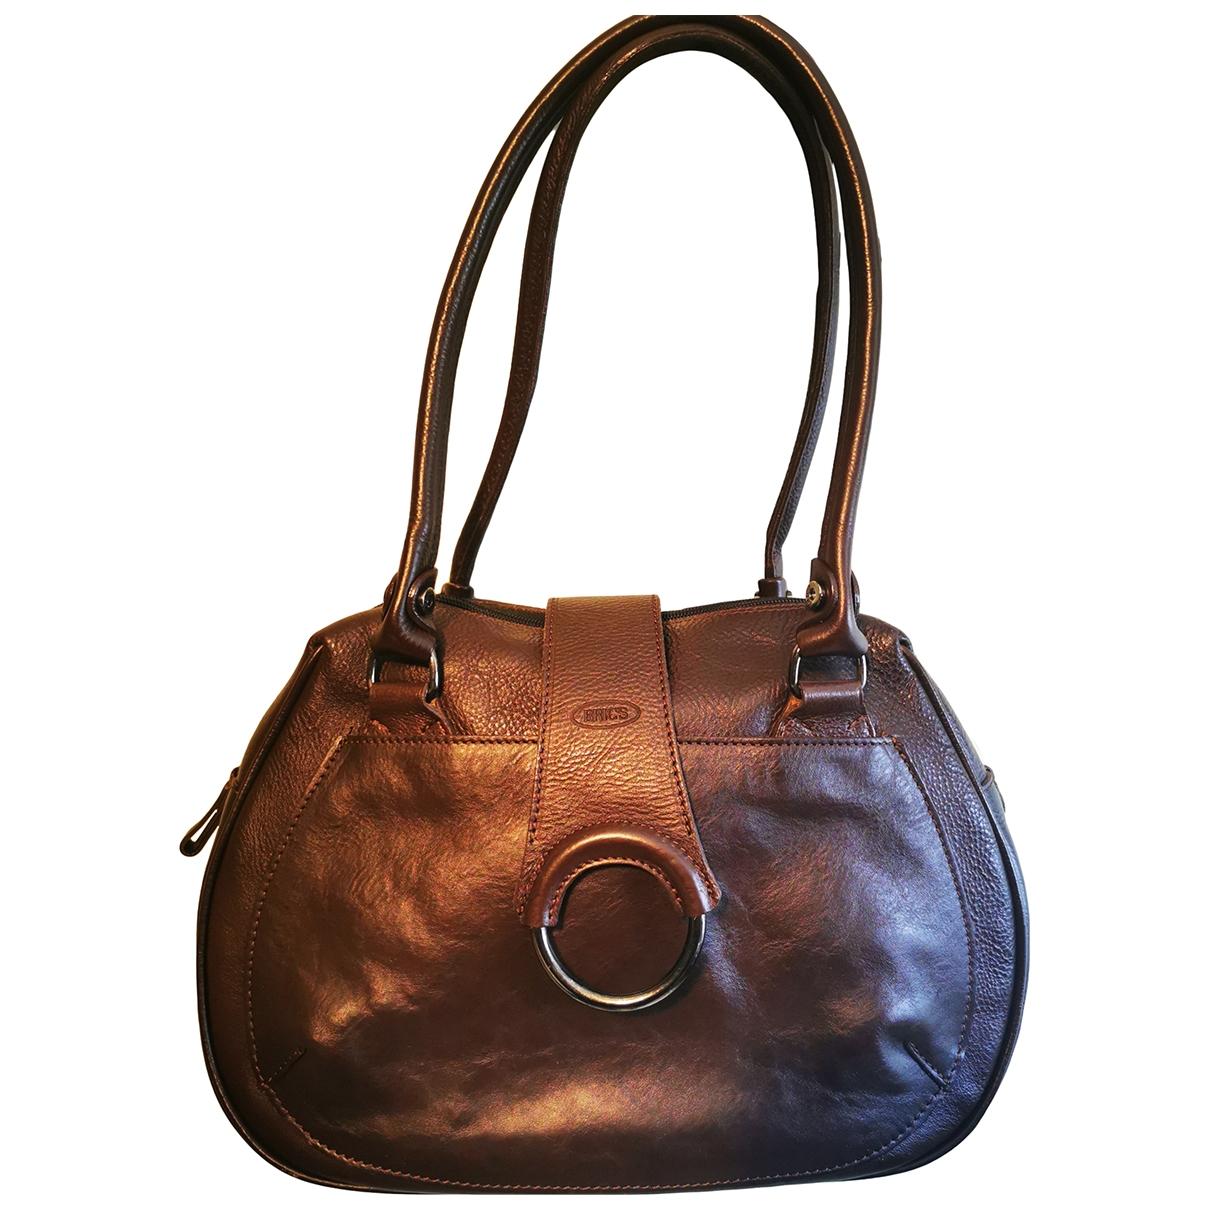 Brics - Sac a main   pour femme en cuir - marron